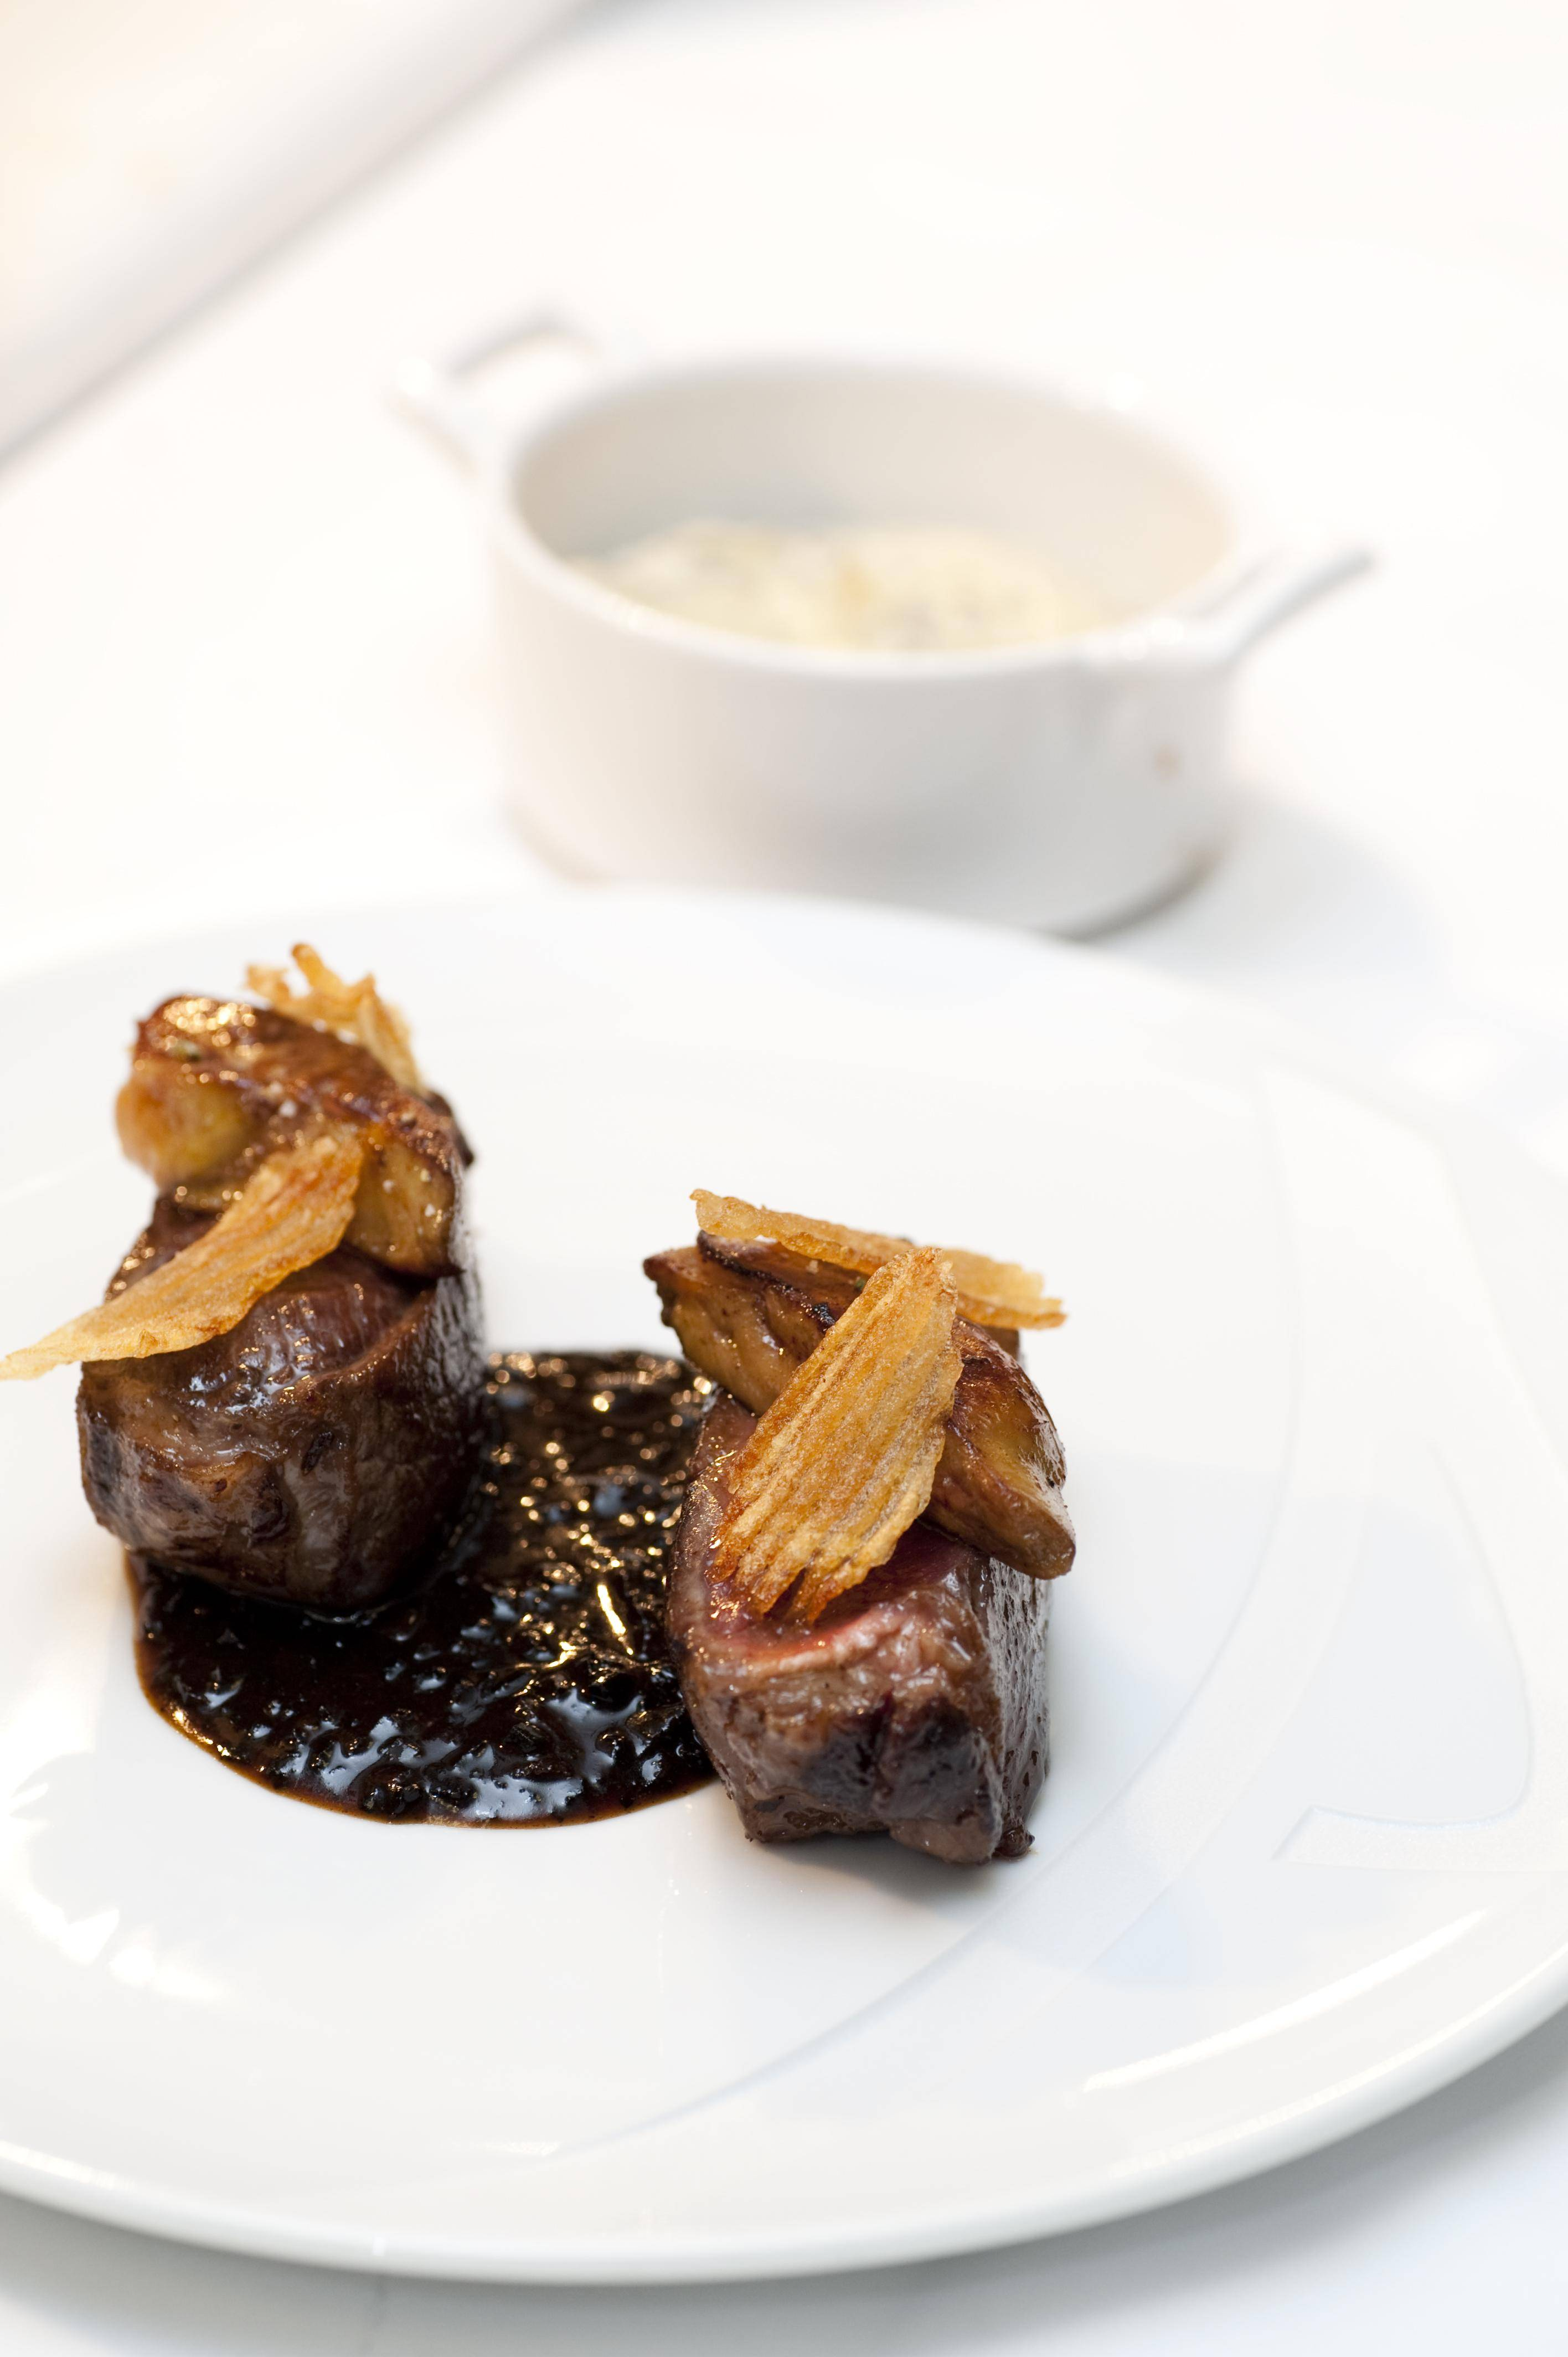 Australian Beef Sirloin Aiguillette Black Truffle Sauce∞ƒ¥Û¿˚—«Œ˜¿‰≈£≈≈≈‰∫⁄À…¬∂÷≠Õ¡∂πƒ‡